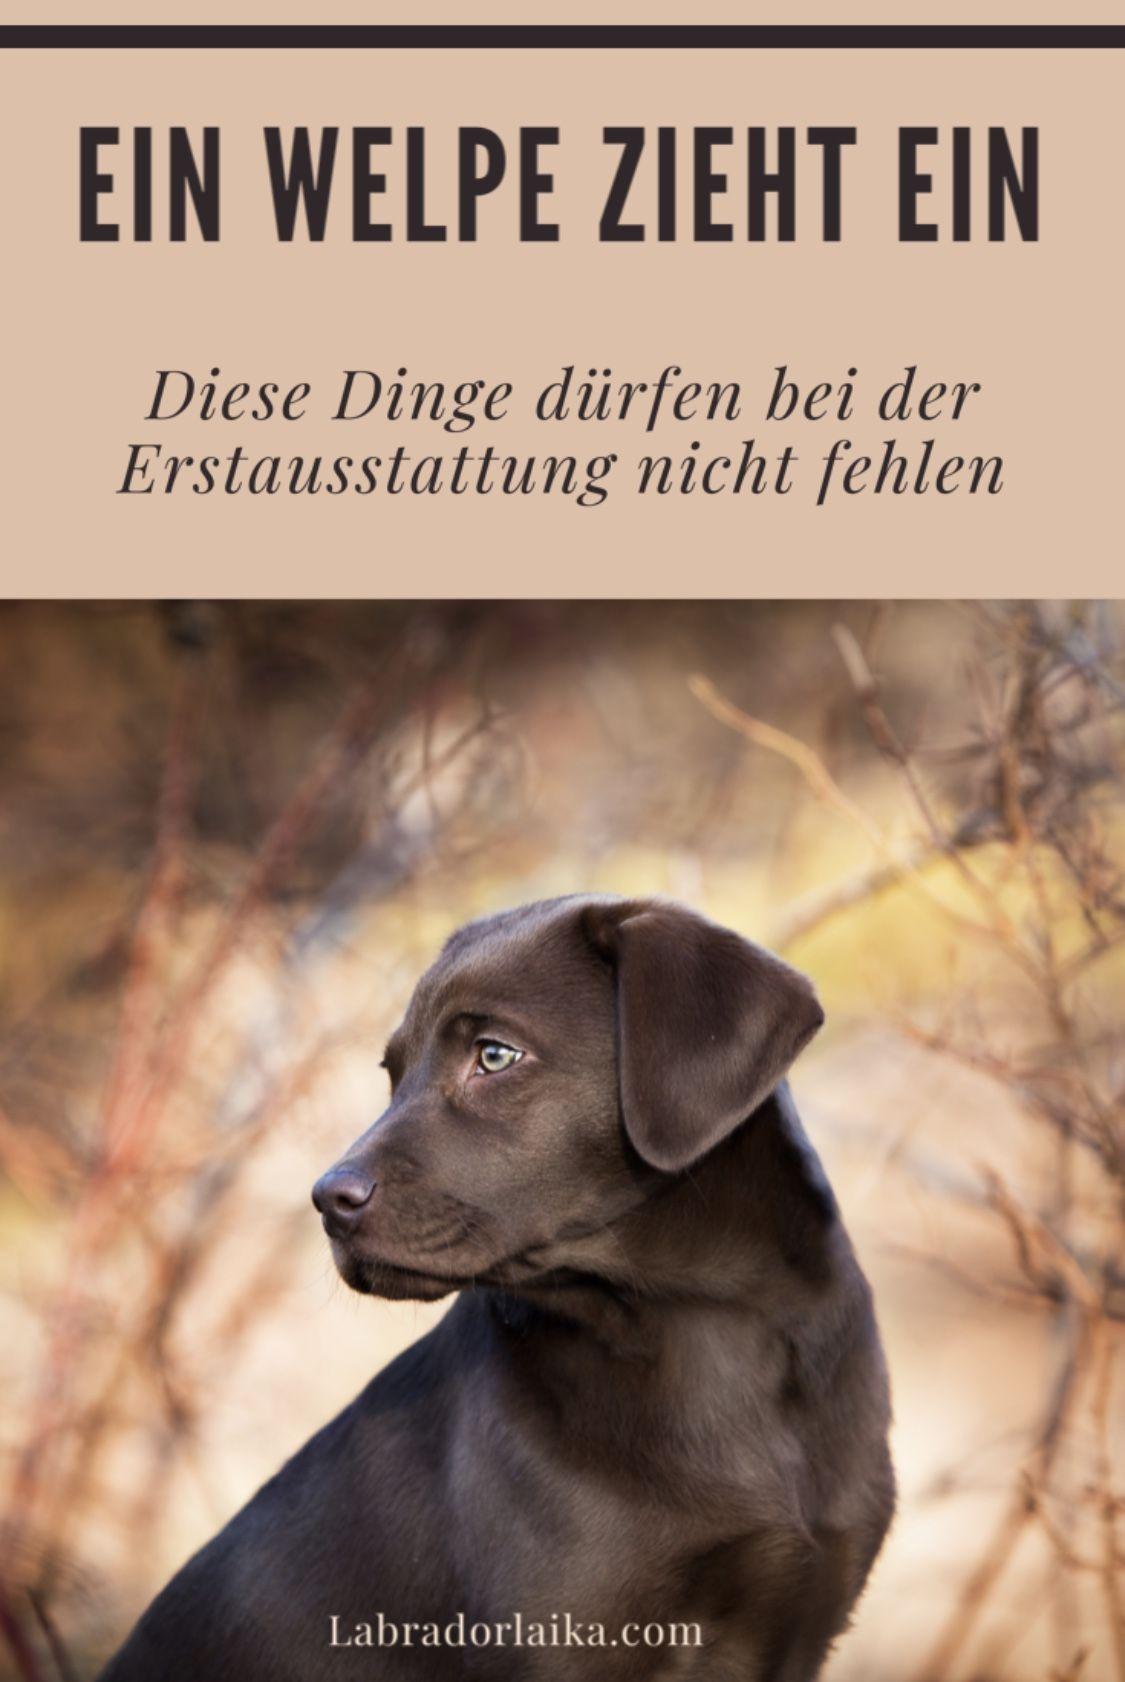 Erstausstattung Fur Einen Welpen Welpen Hunde Und Chihuahua Welpen